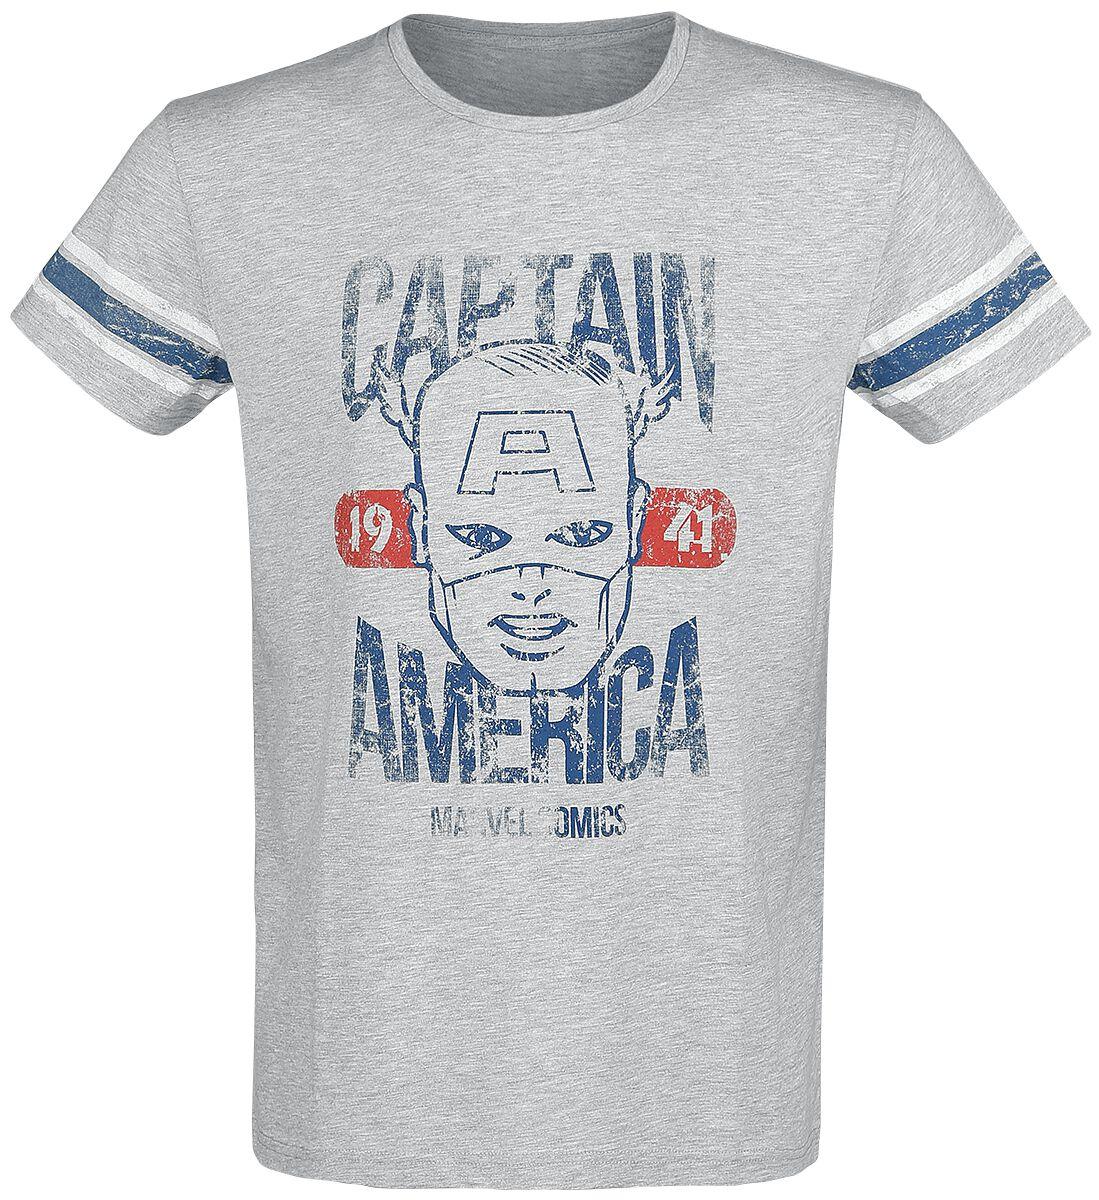 Image of   Captain America Marvel Comics 1941 T-Shirt blandet lys grå